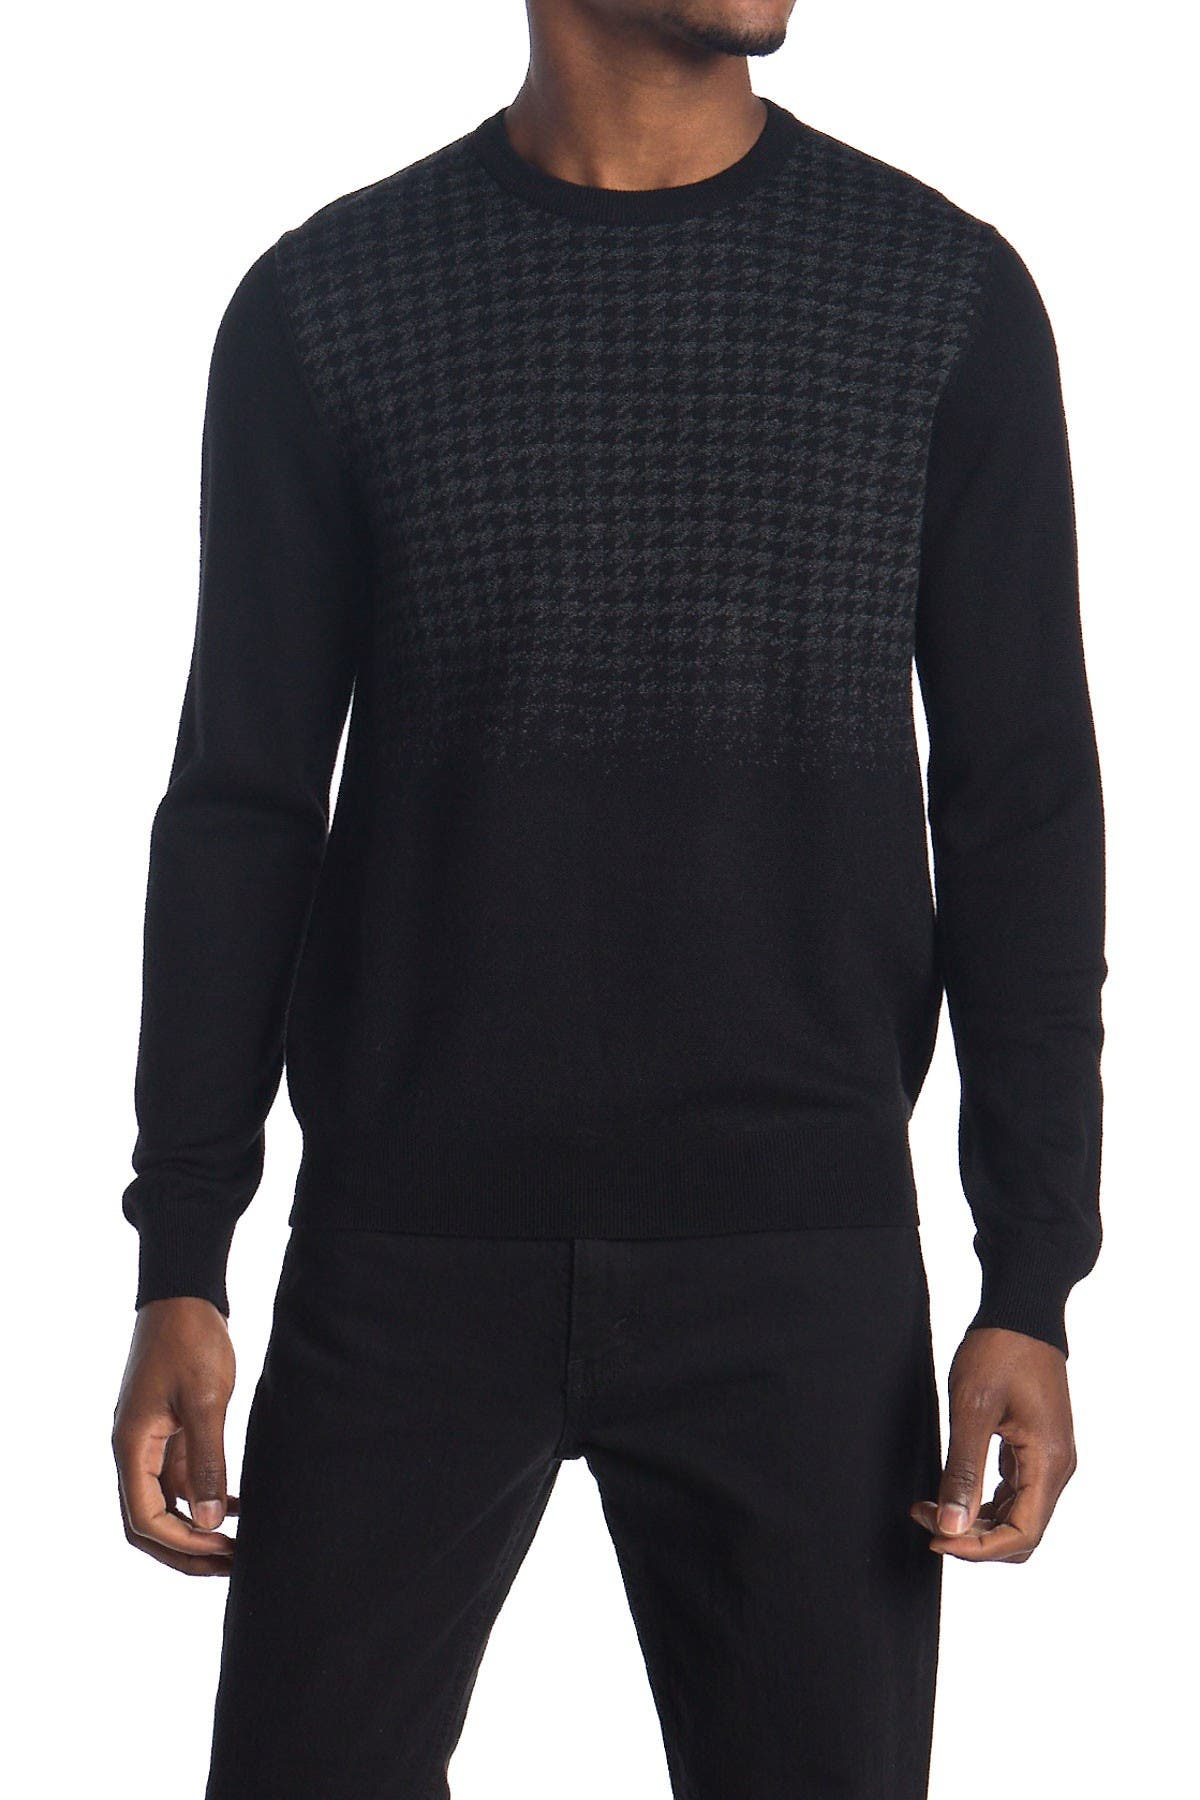 Image of Stewart of Scotland Degrade Houndstooth Merino Wool Sweater